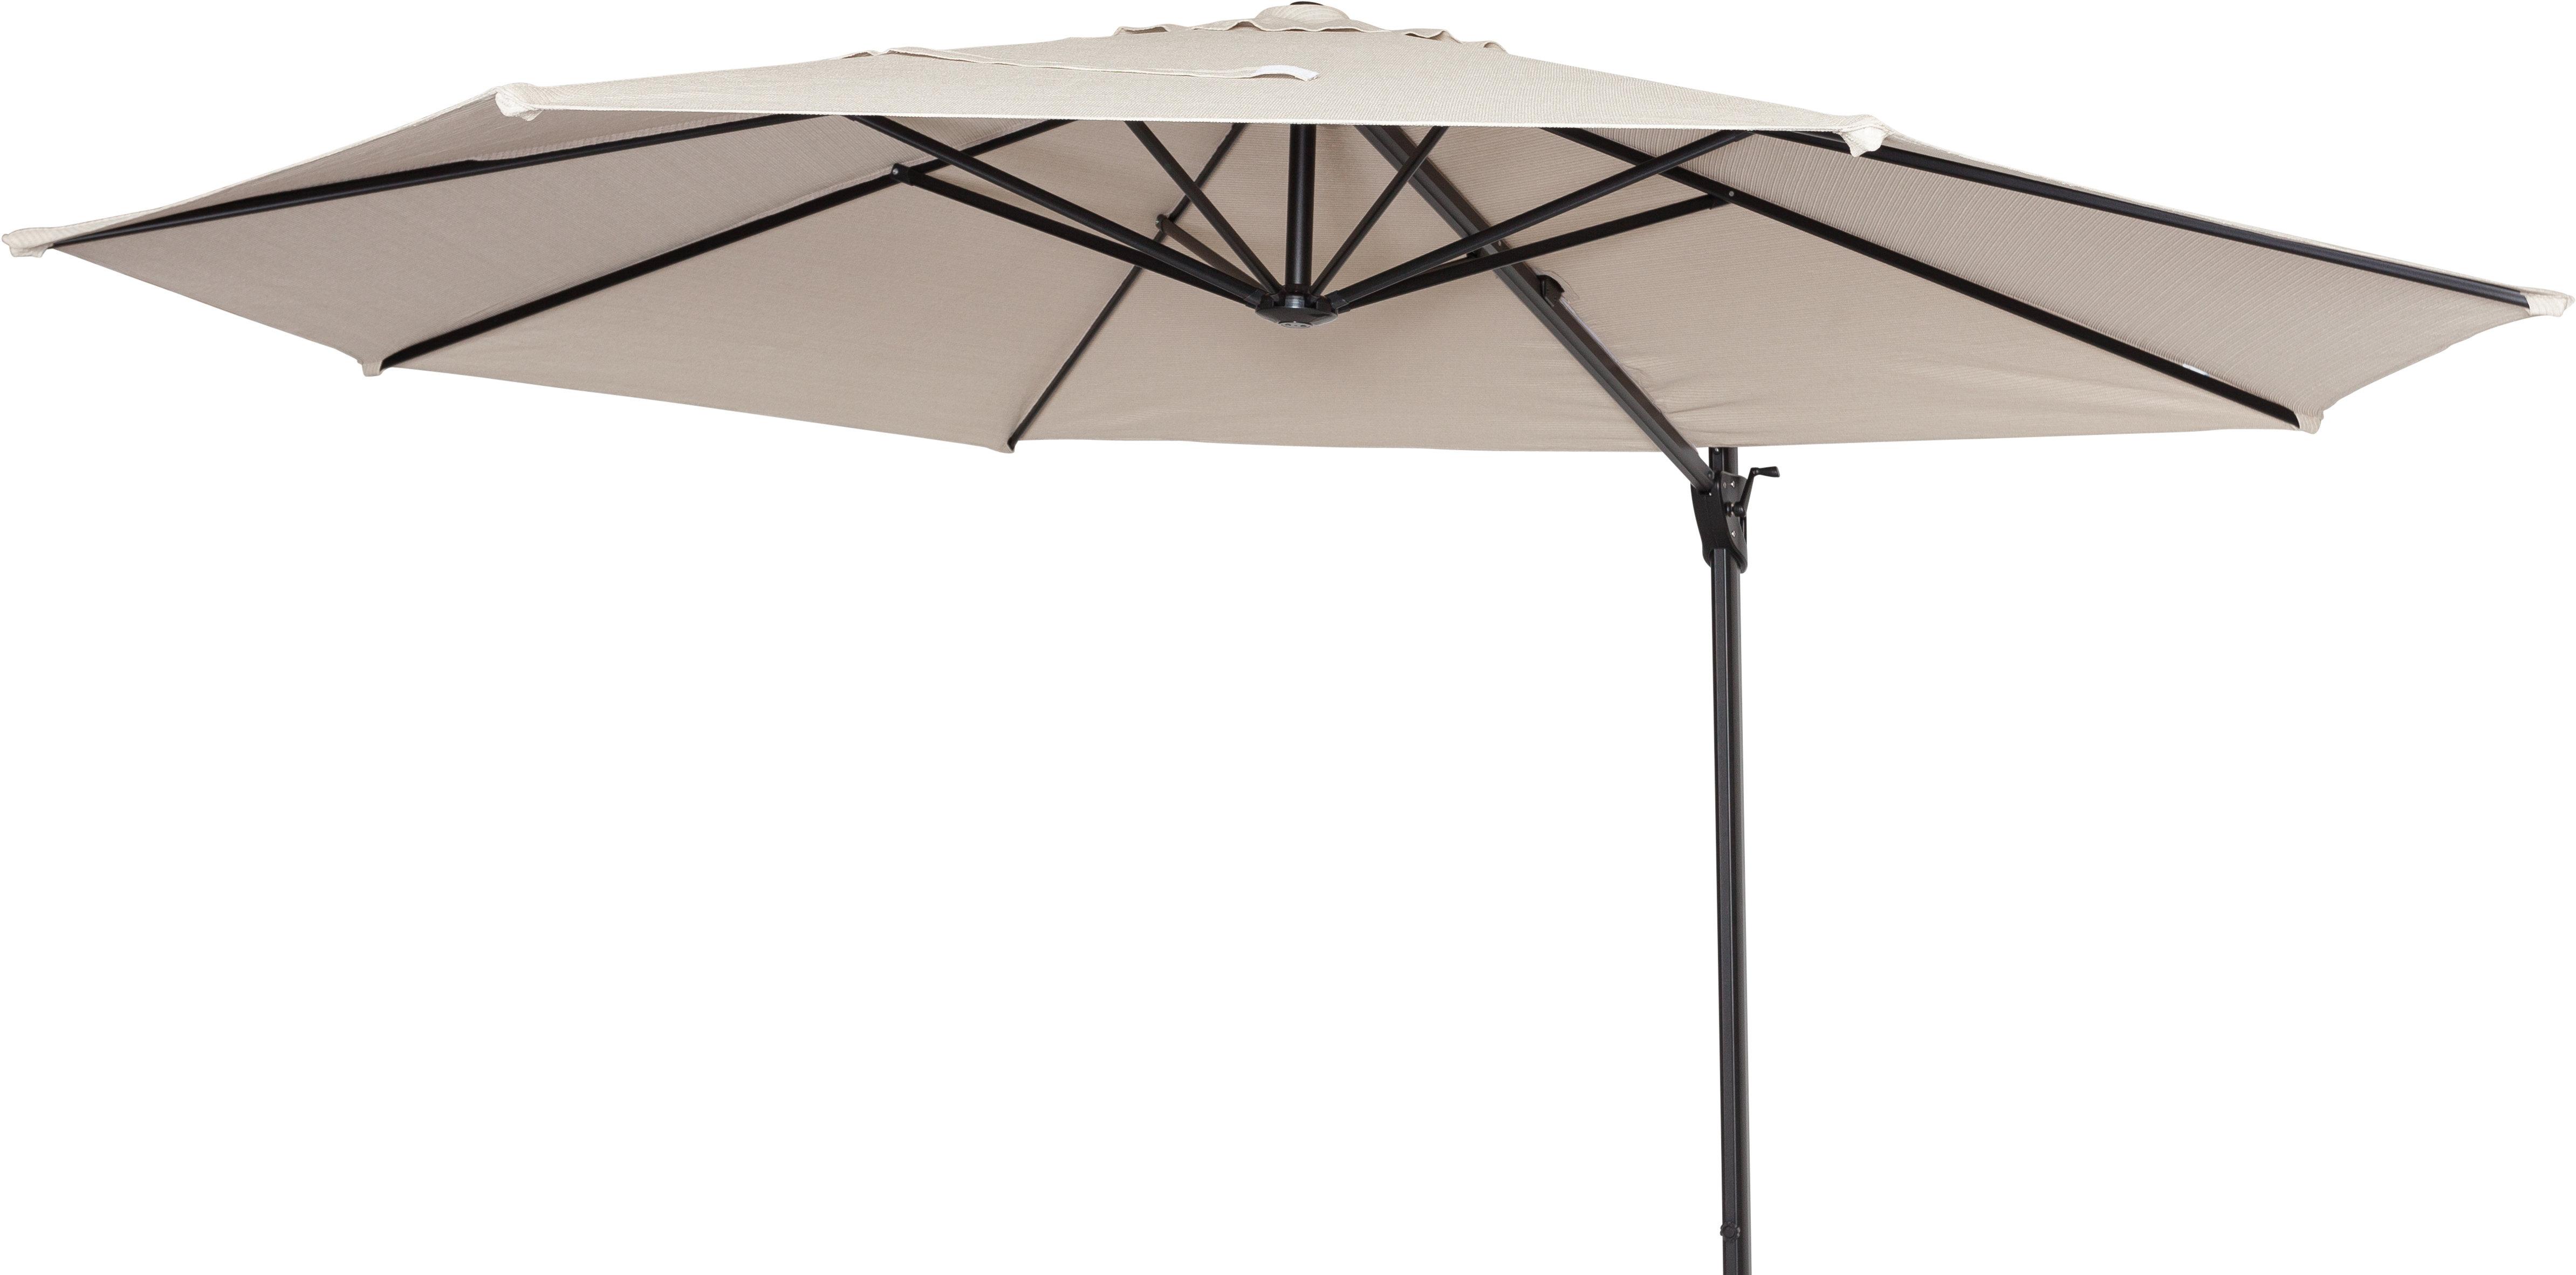 Fazeley Rectangular Cantilever Umbrellas Inside Best And Newest 12' Cantilever Umbrella (View 4 of 20)